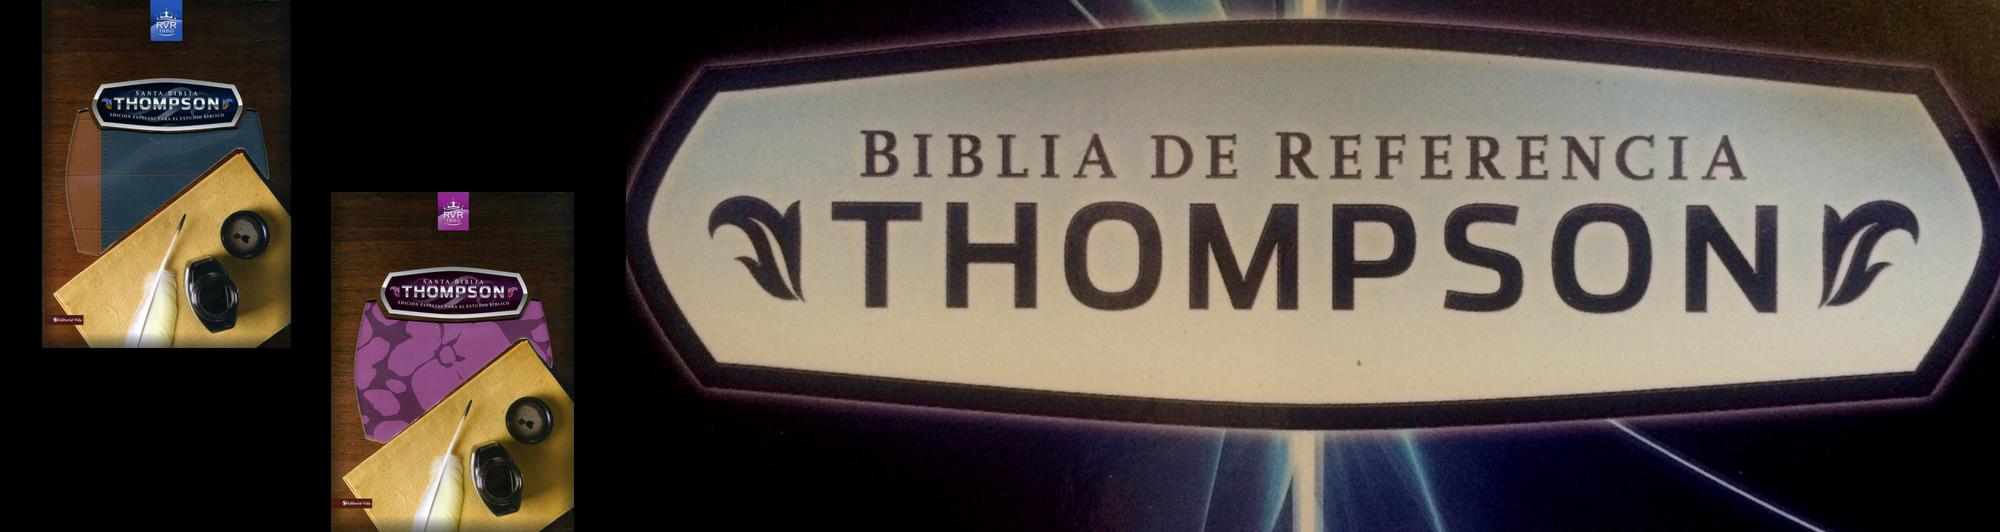 Biblia Thompson Librería Cristiana Clc Colombia Biblia De